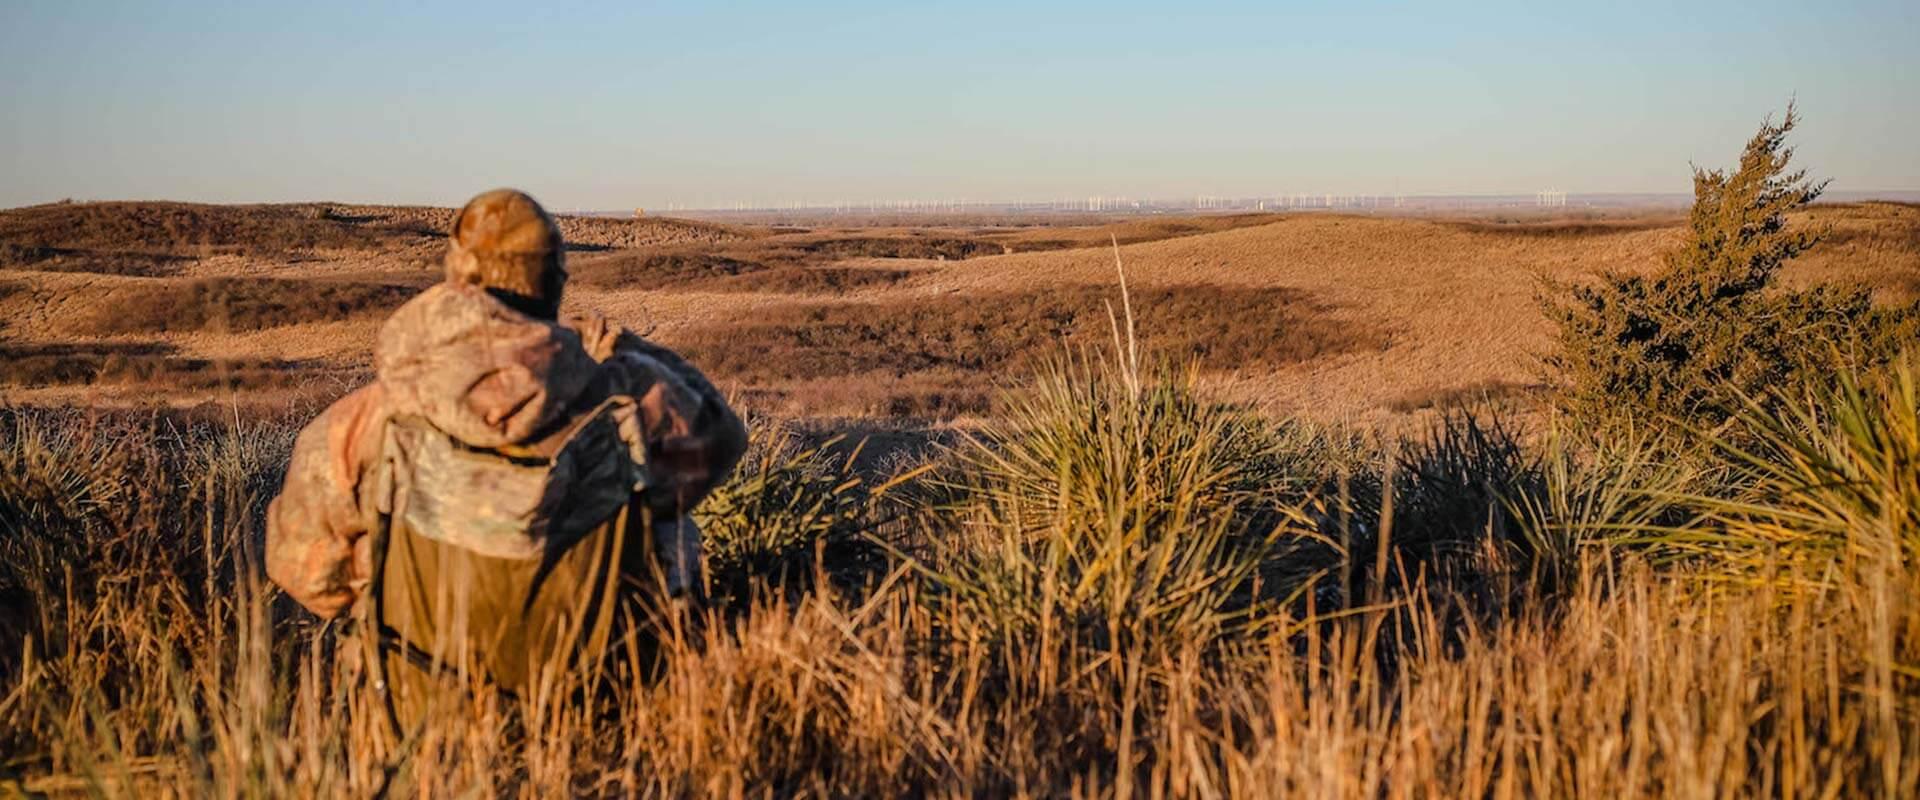 Guided Kansas Coyote Hunting, Varmint Hunts & Bobcat Hunting